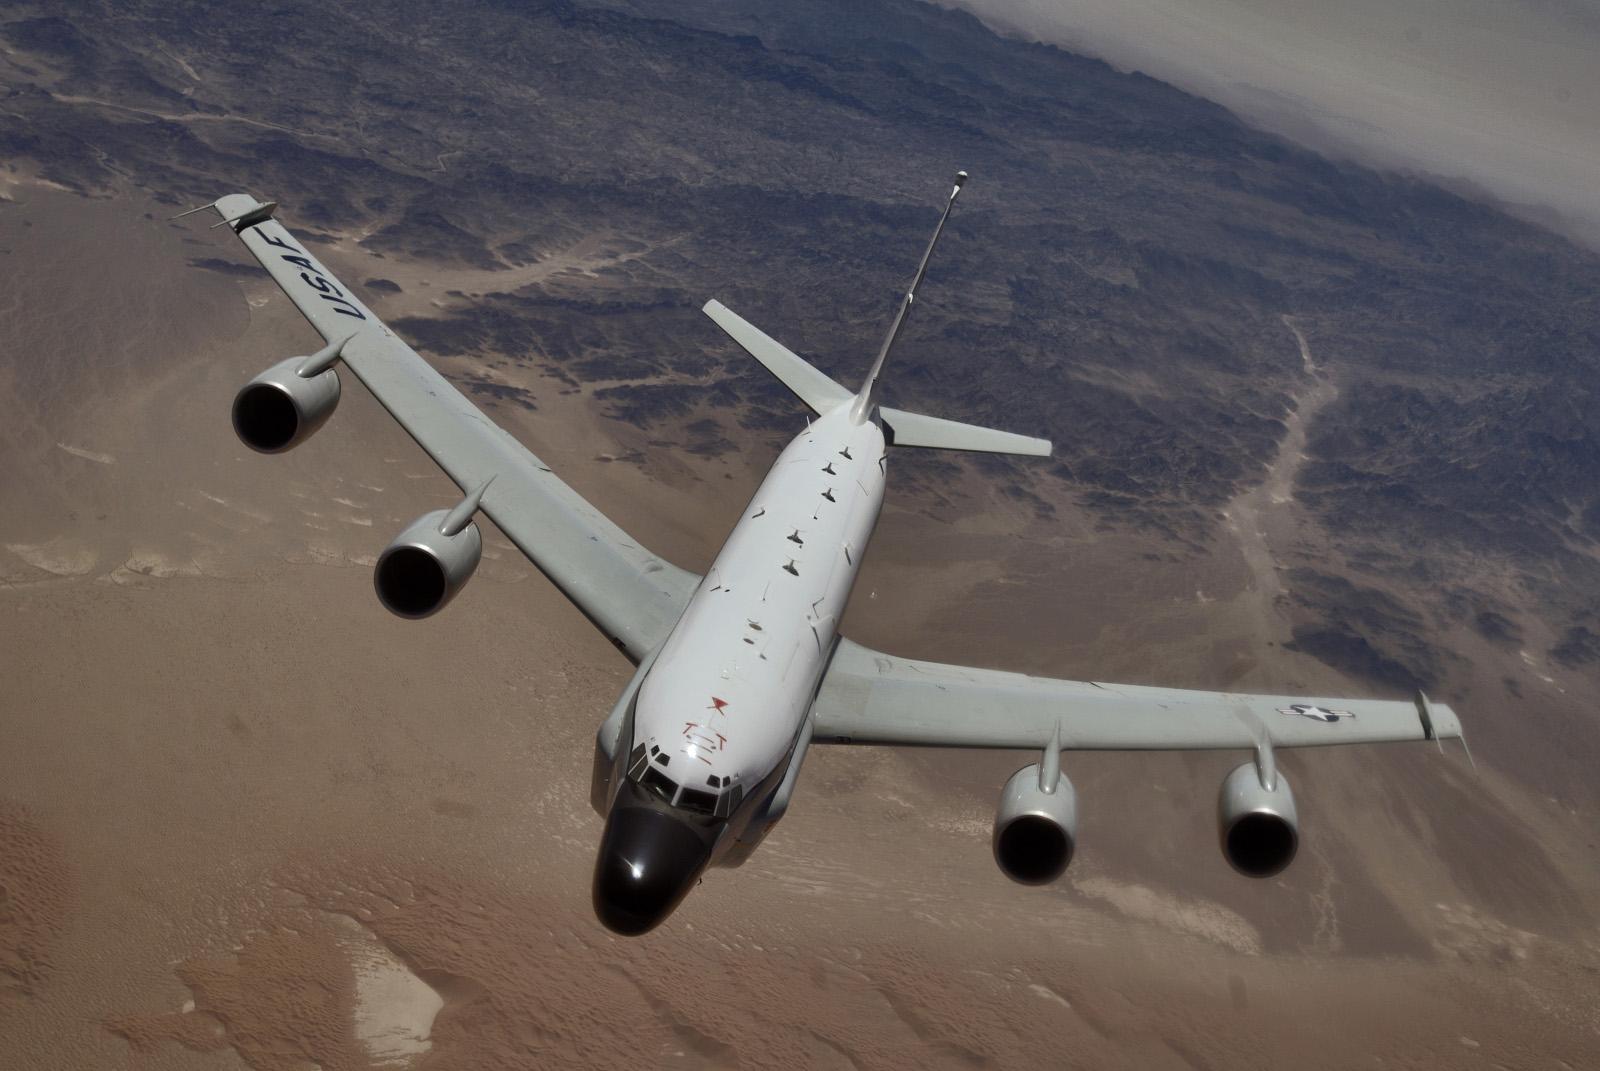 Boeing RC-135 Rivet Joint